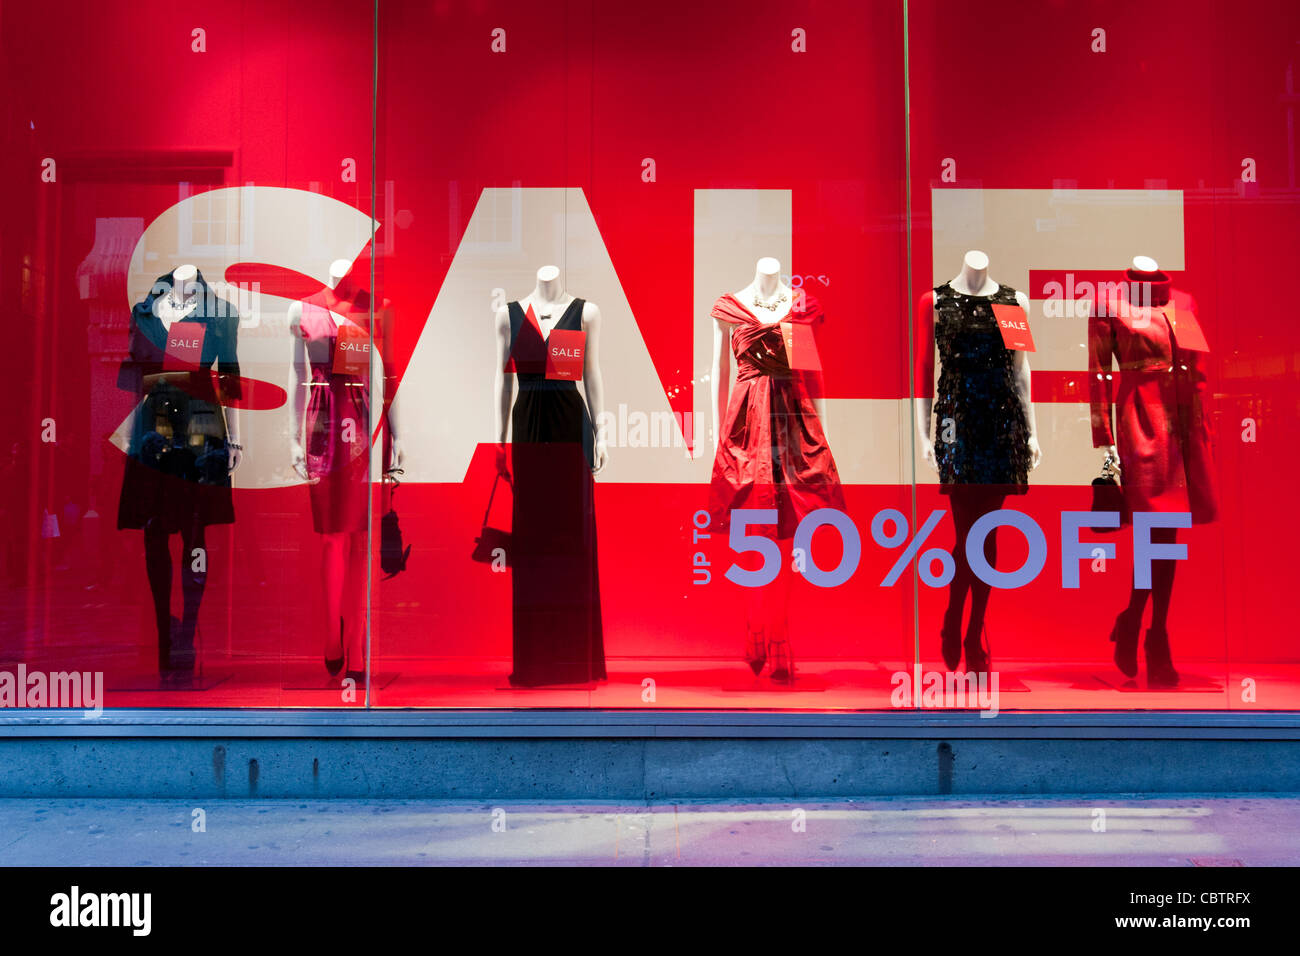 Sales at Hobbs clothes shop, London, England, UK - Stock Image